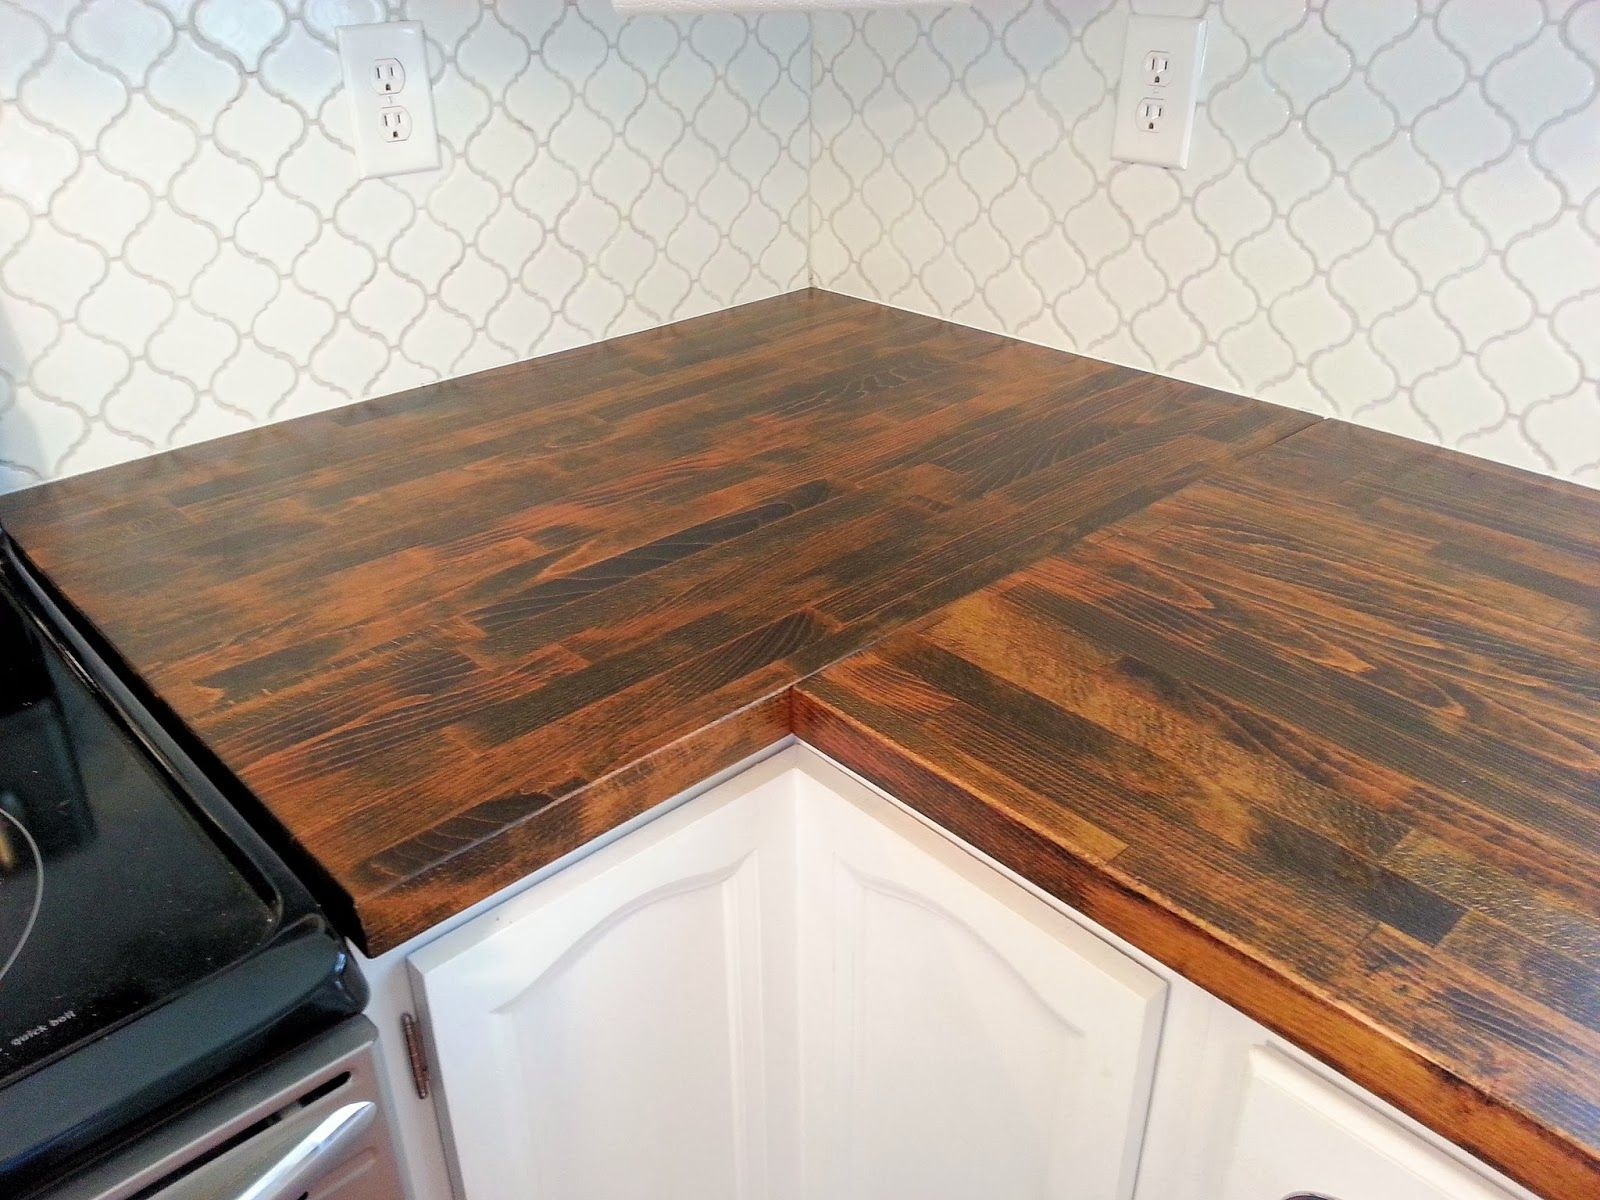 ikea wooden countertops wood kitchen countertops Images About Butcher Block On Pinterest Countertops Wood